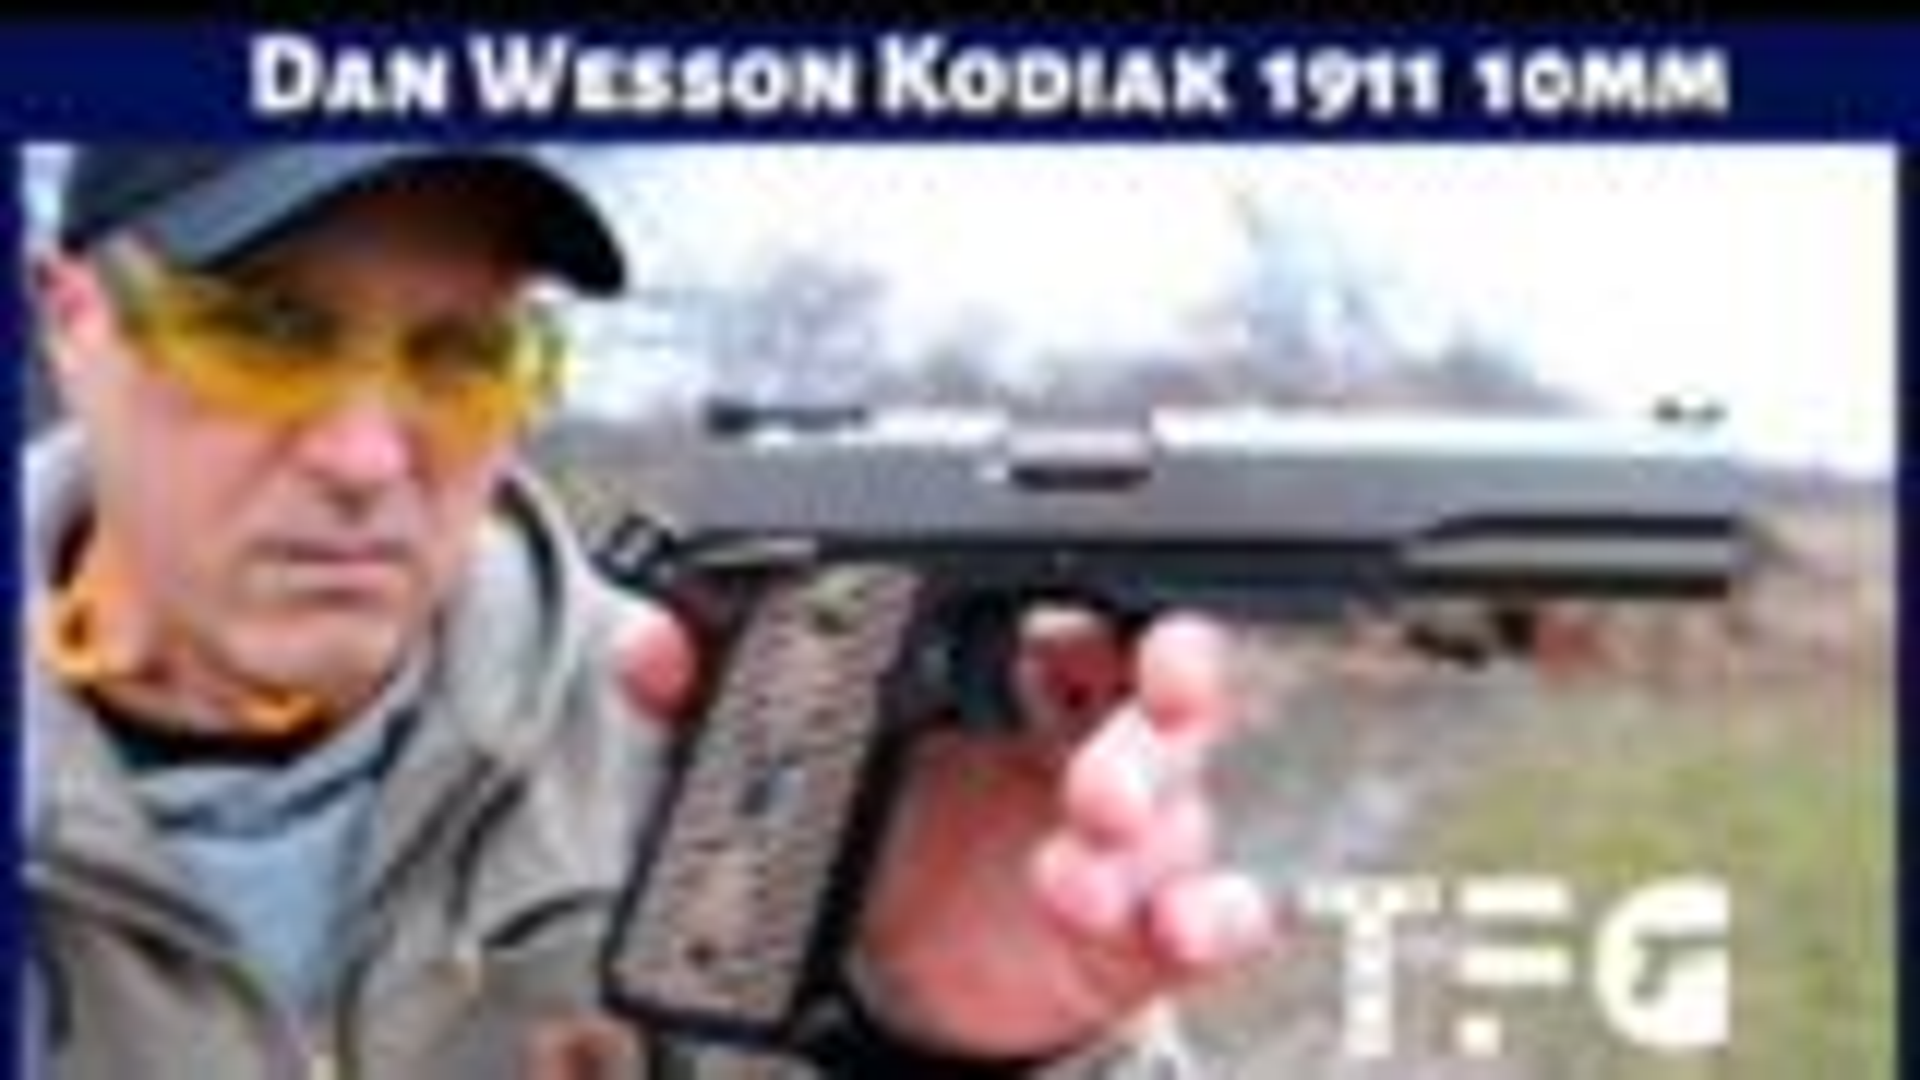 "[TheFirearmGuy]丹威森""科迪亚克""1911手枪"